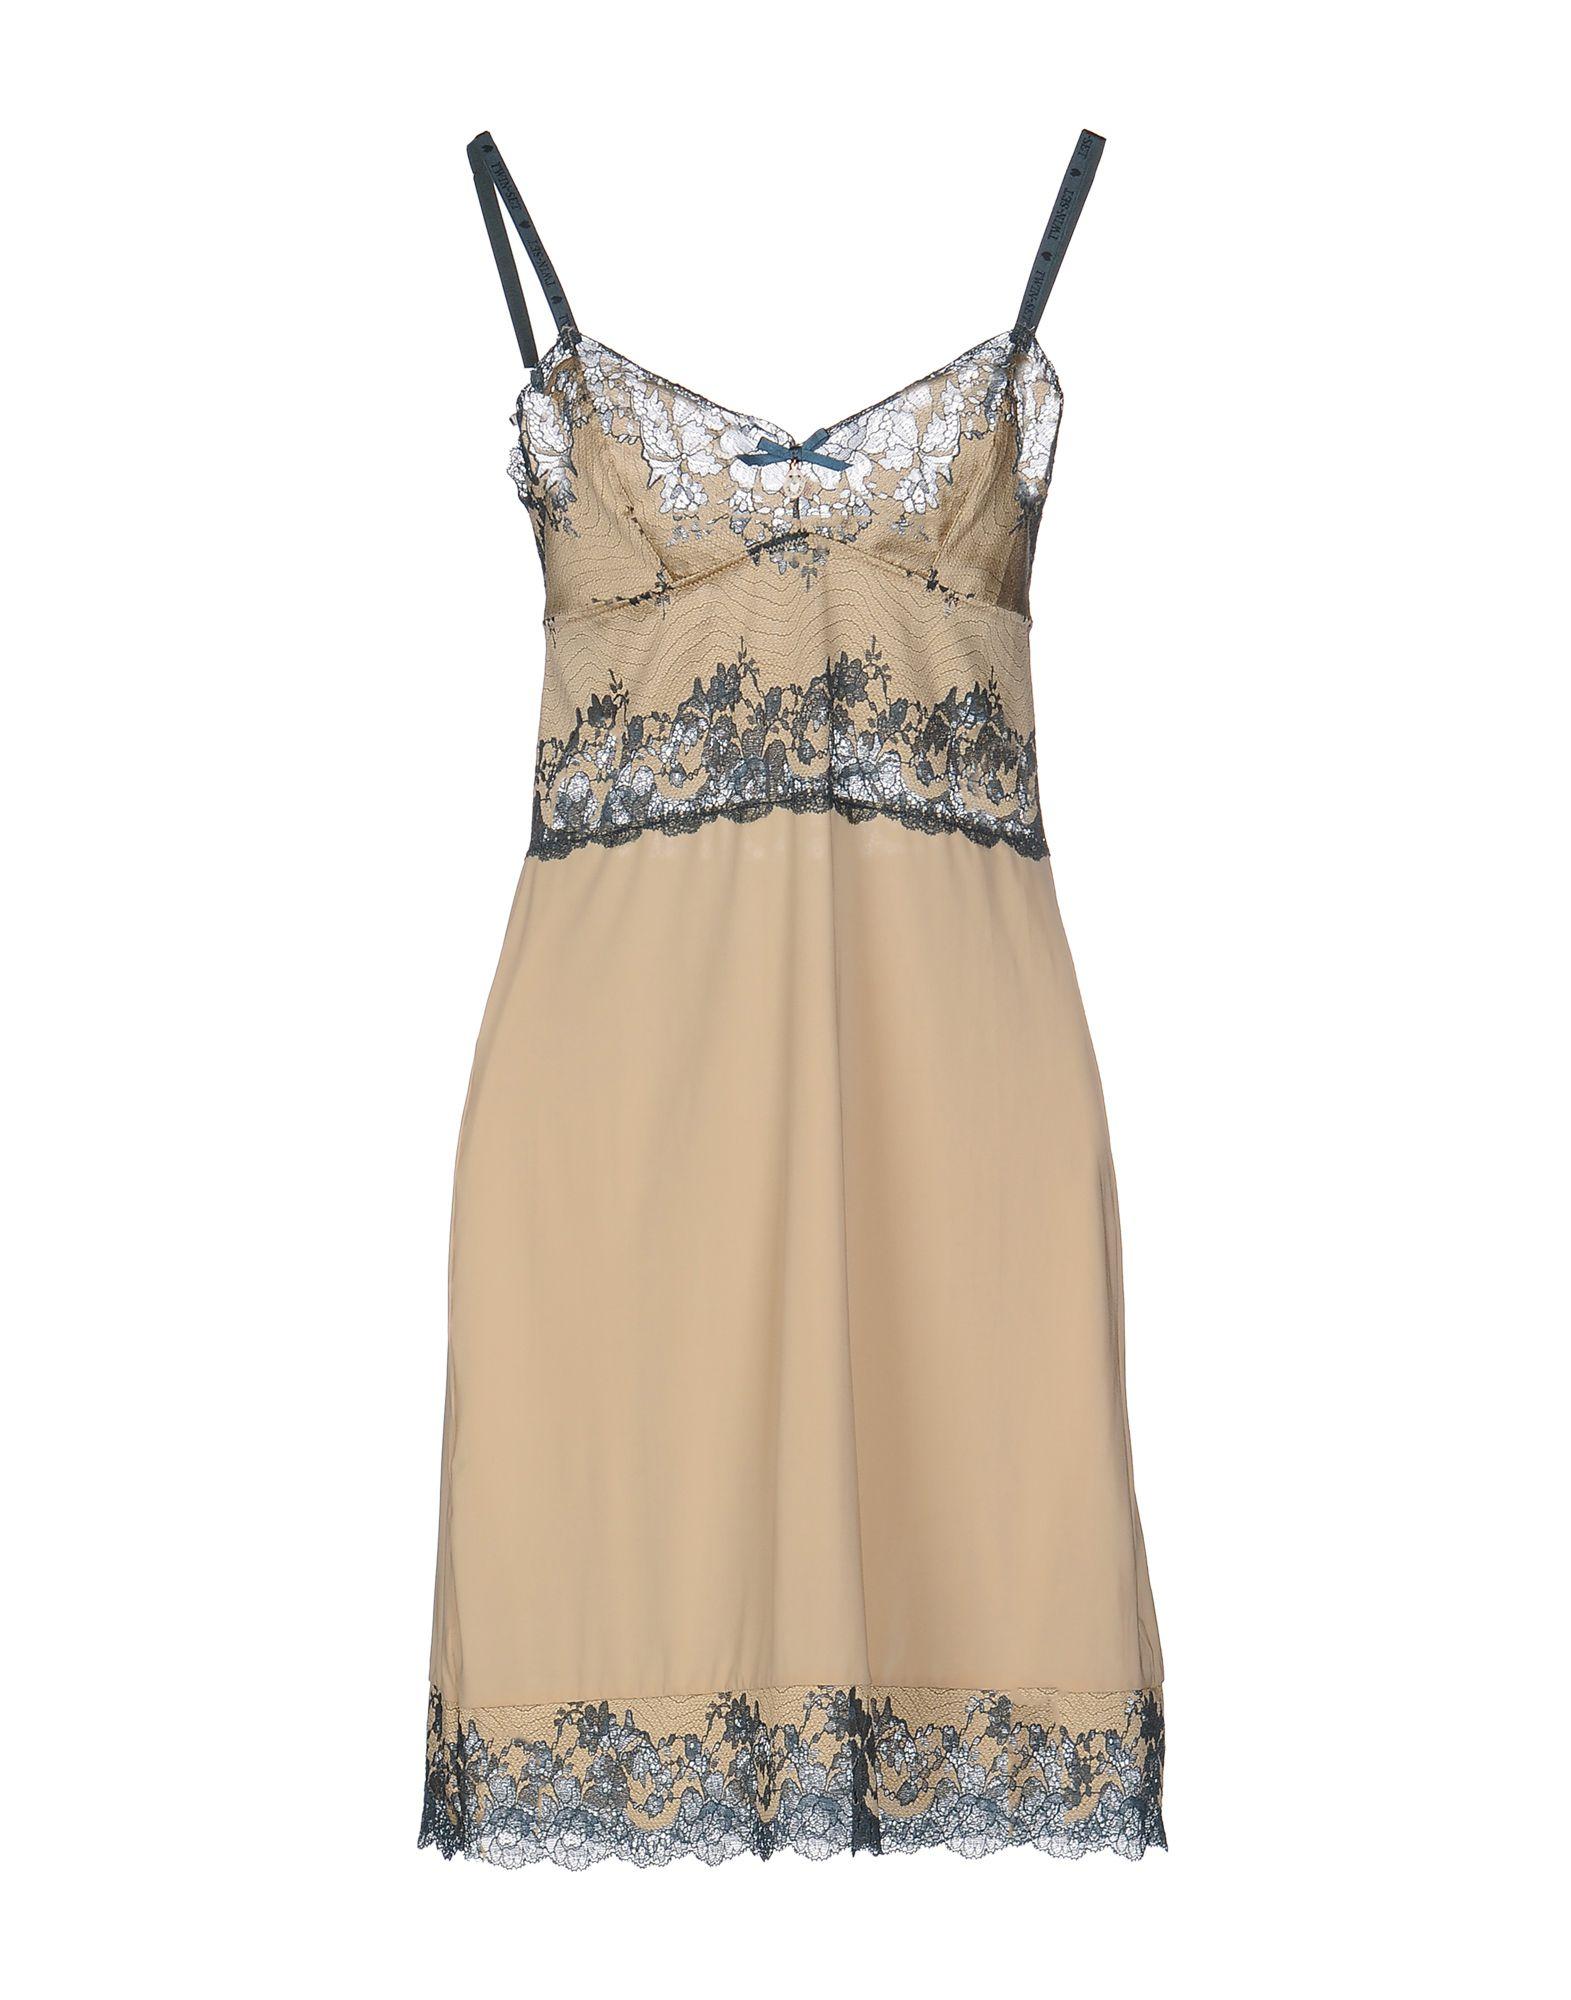 TWIN-SET LINGERIE Ночная рубашка lace insert cut out strappy lingerie set